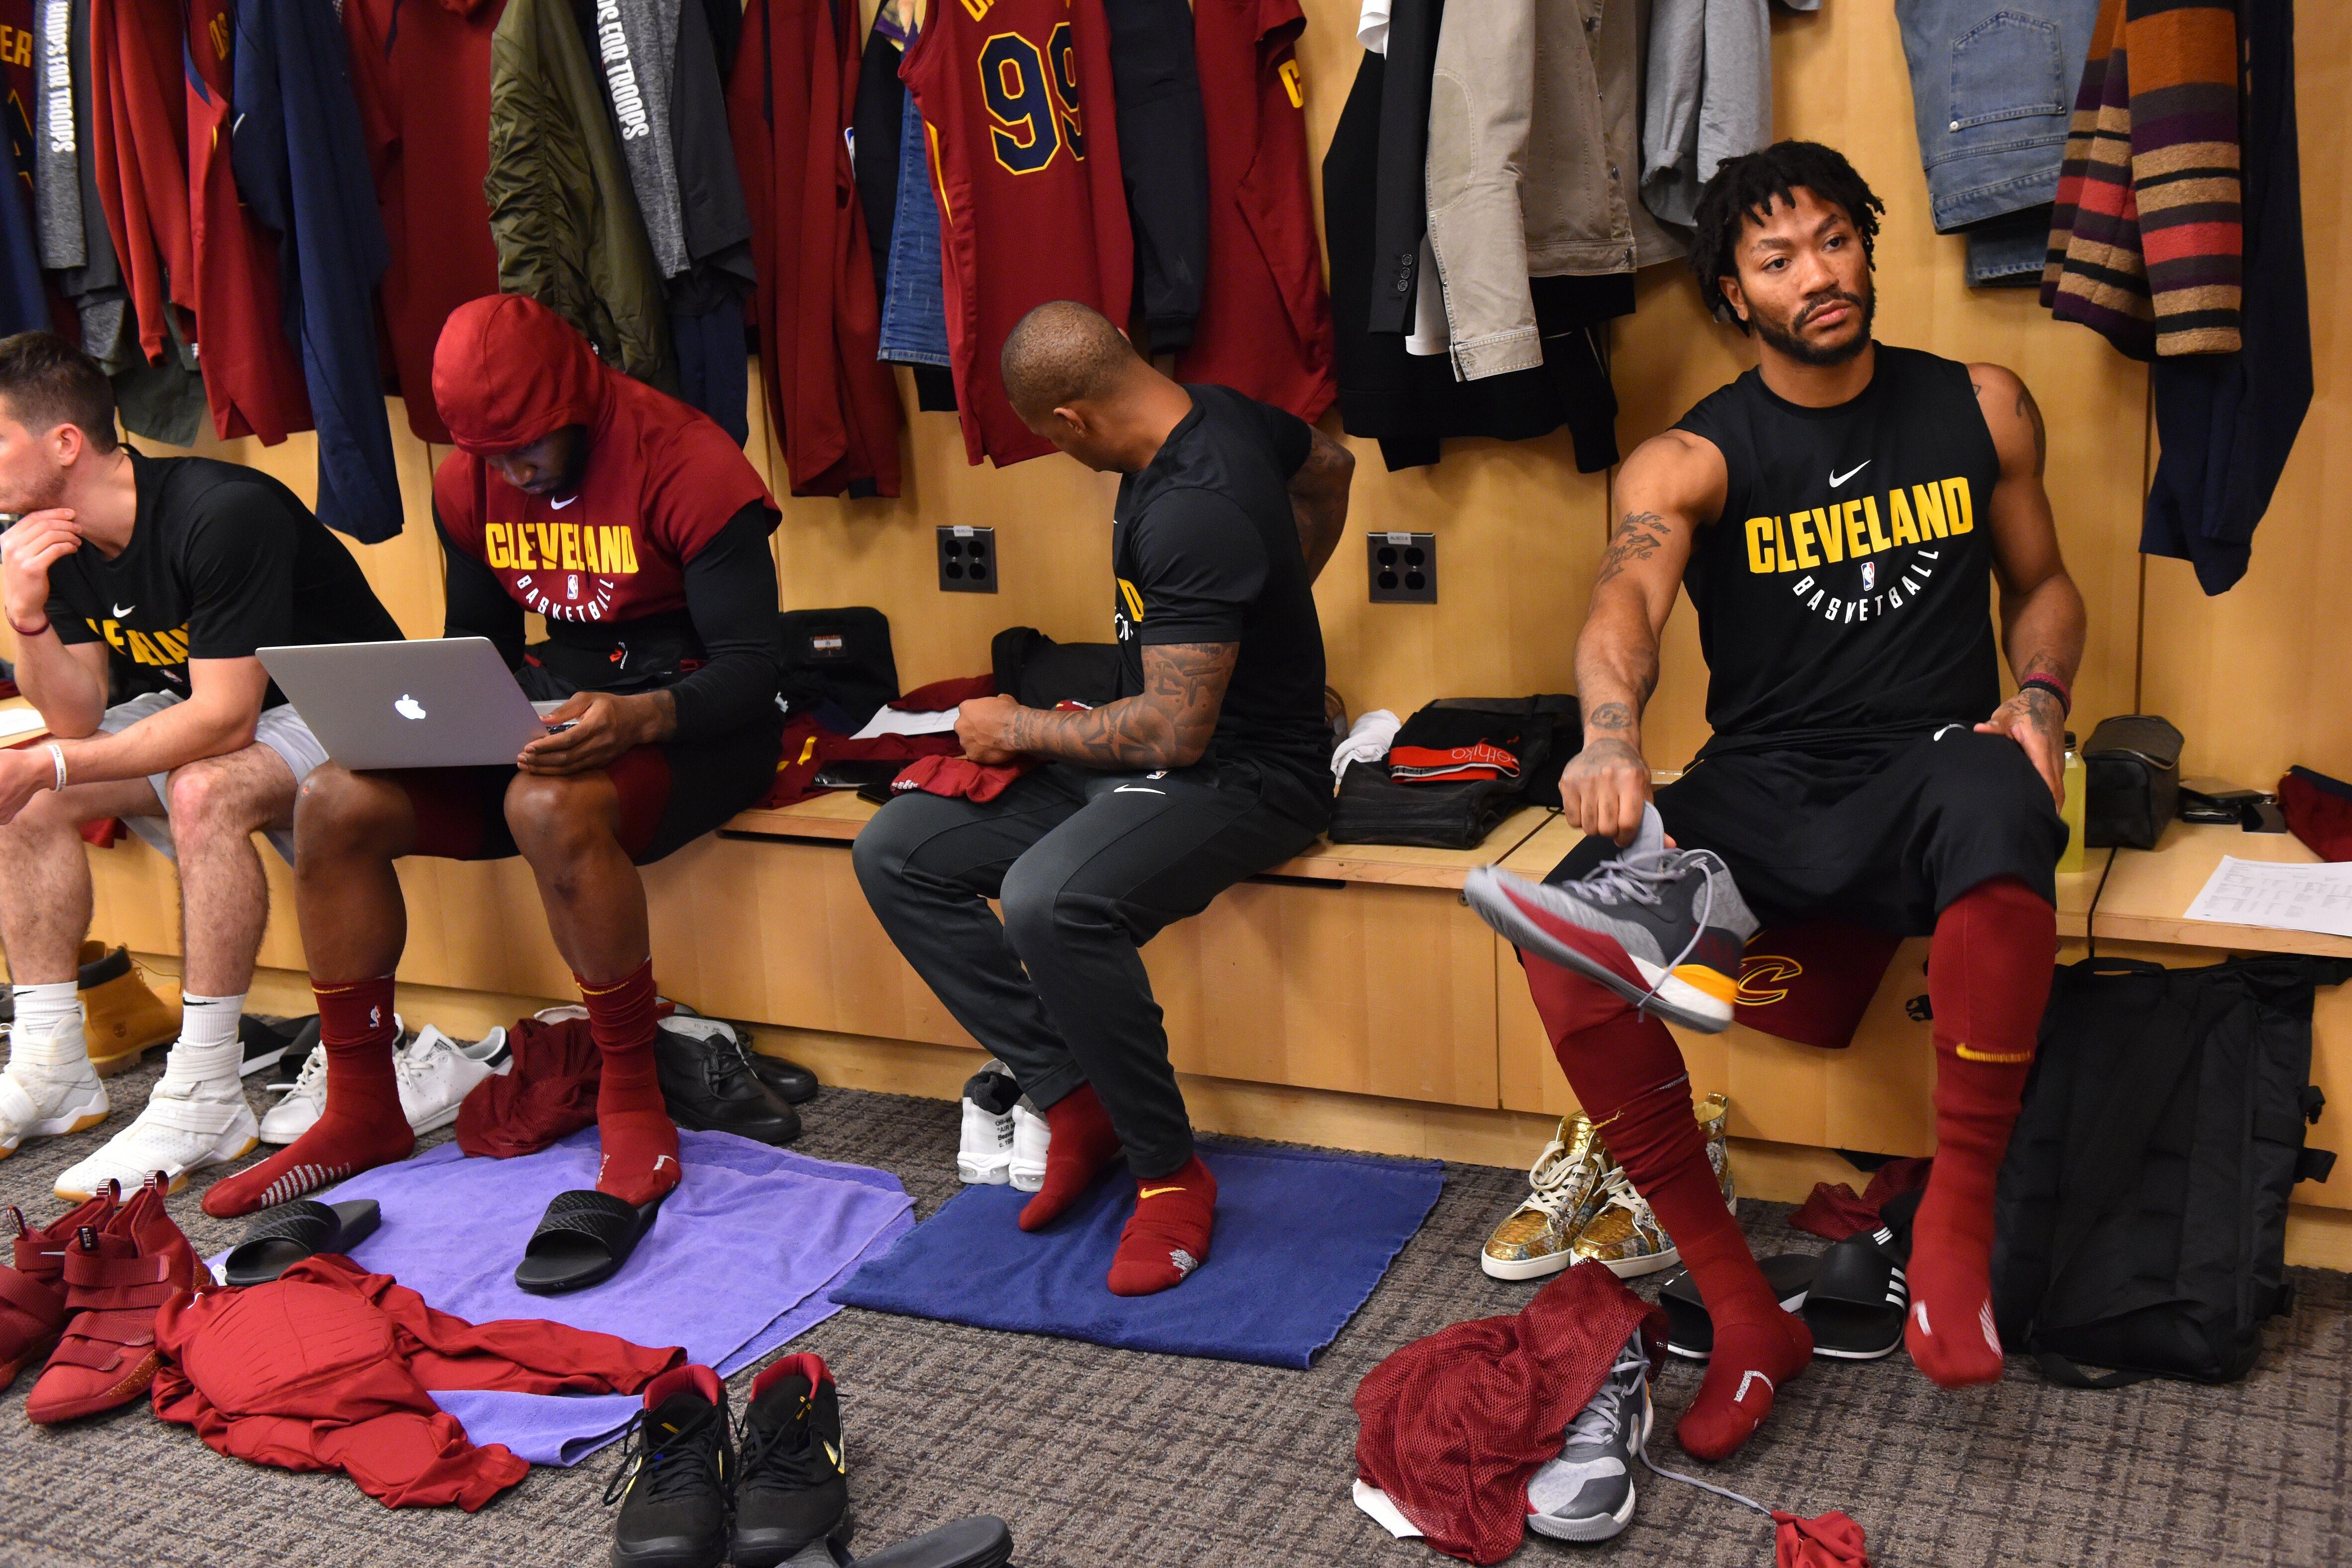 e9b4e103dc5b Cleveland Cavaliers  Is trading Derrick Rose an option